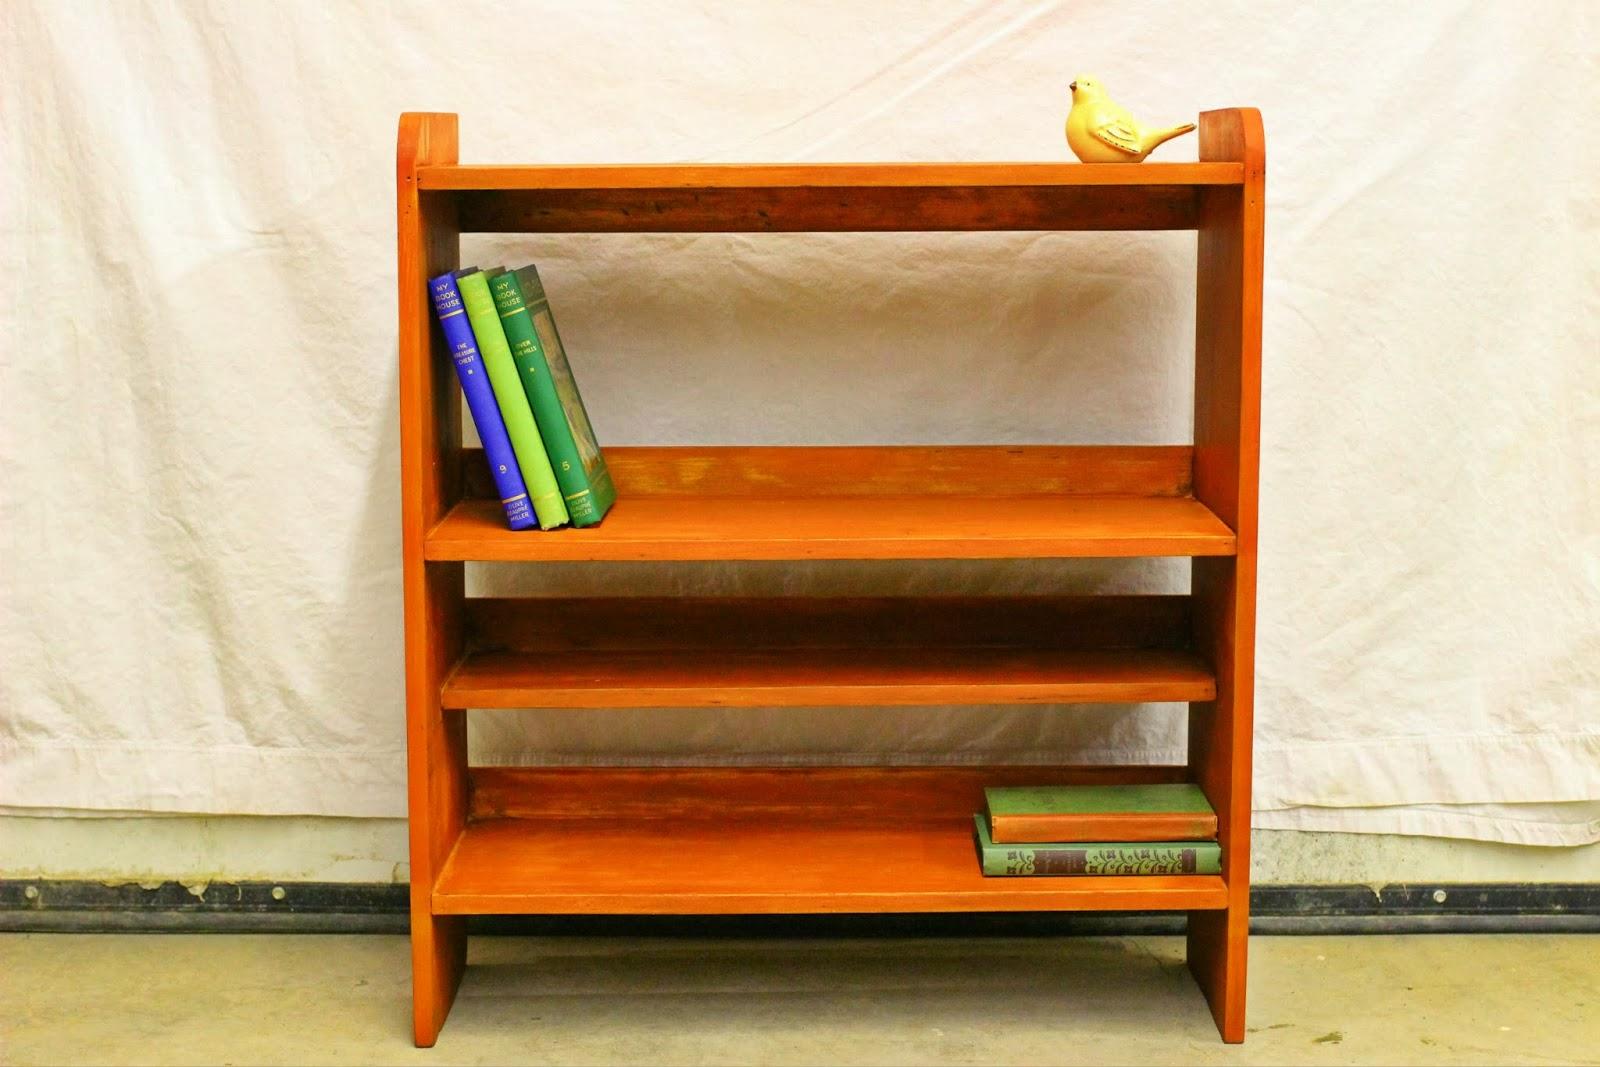 Hamiltonkijijica C Buy And Sell Furniture Bookcases Shelving Units Orange Rustic Bookshelf W0QQAdIdZ572627197